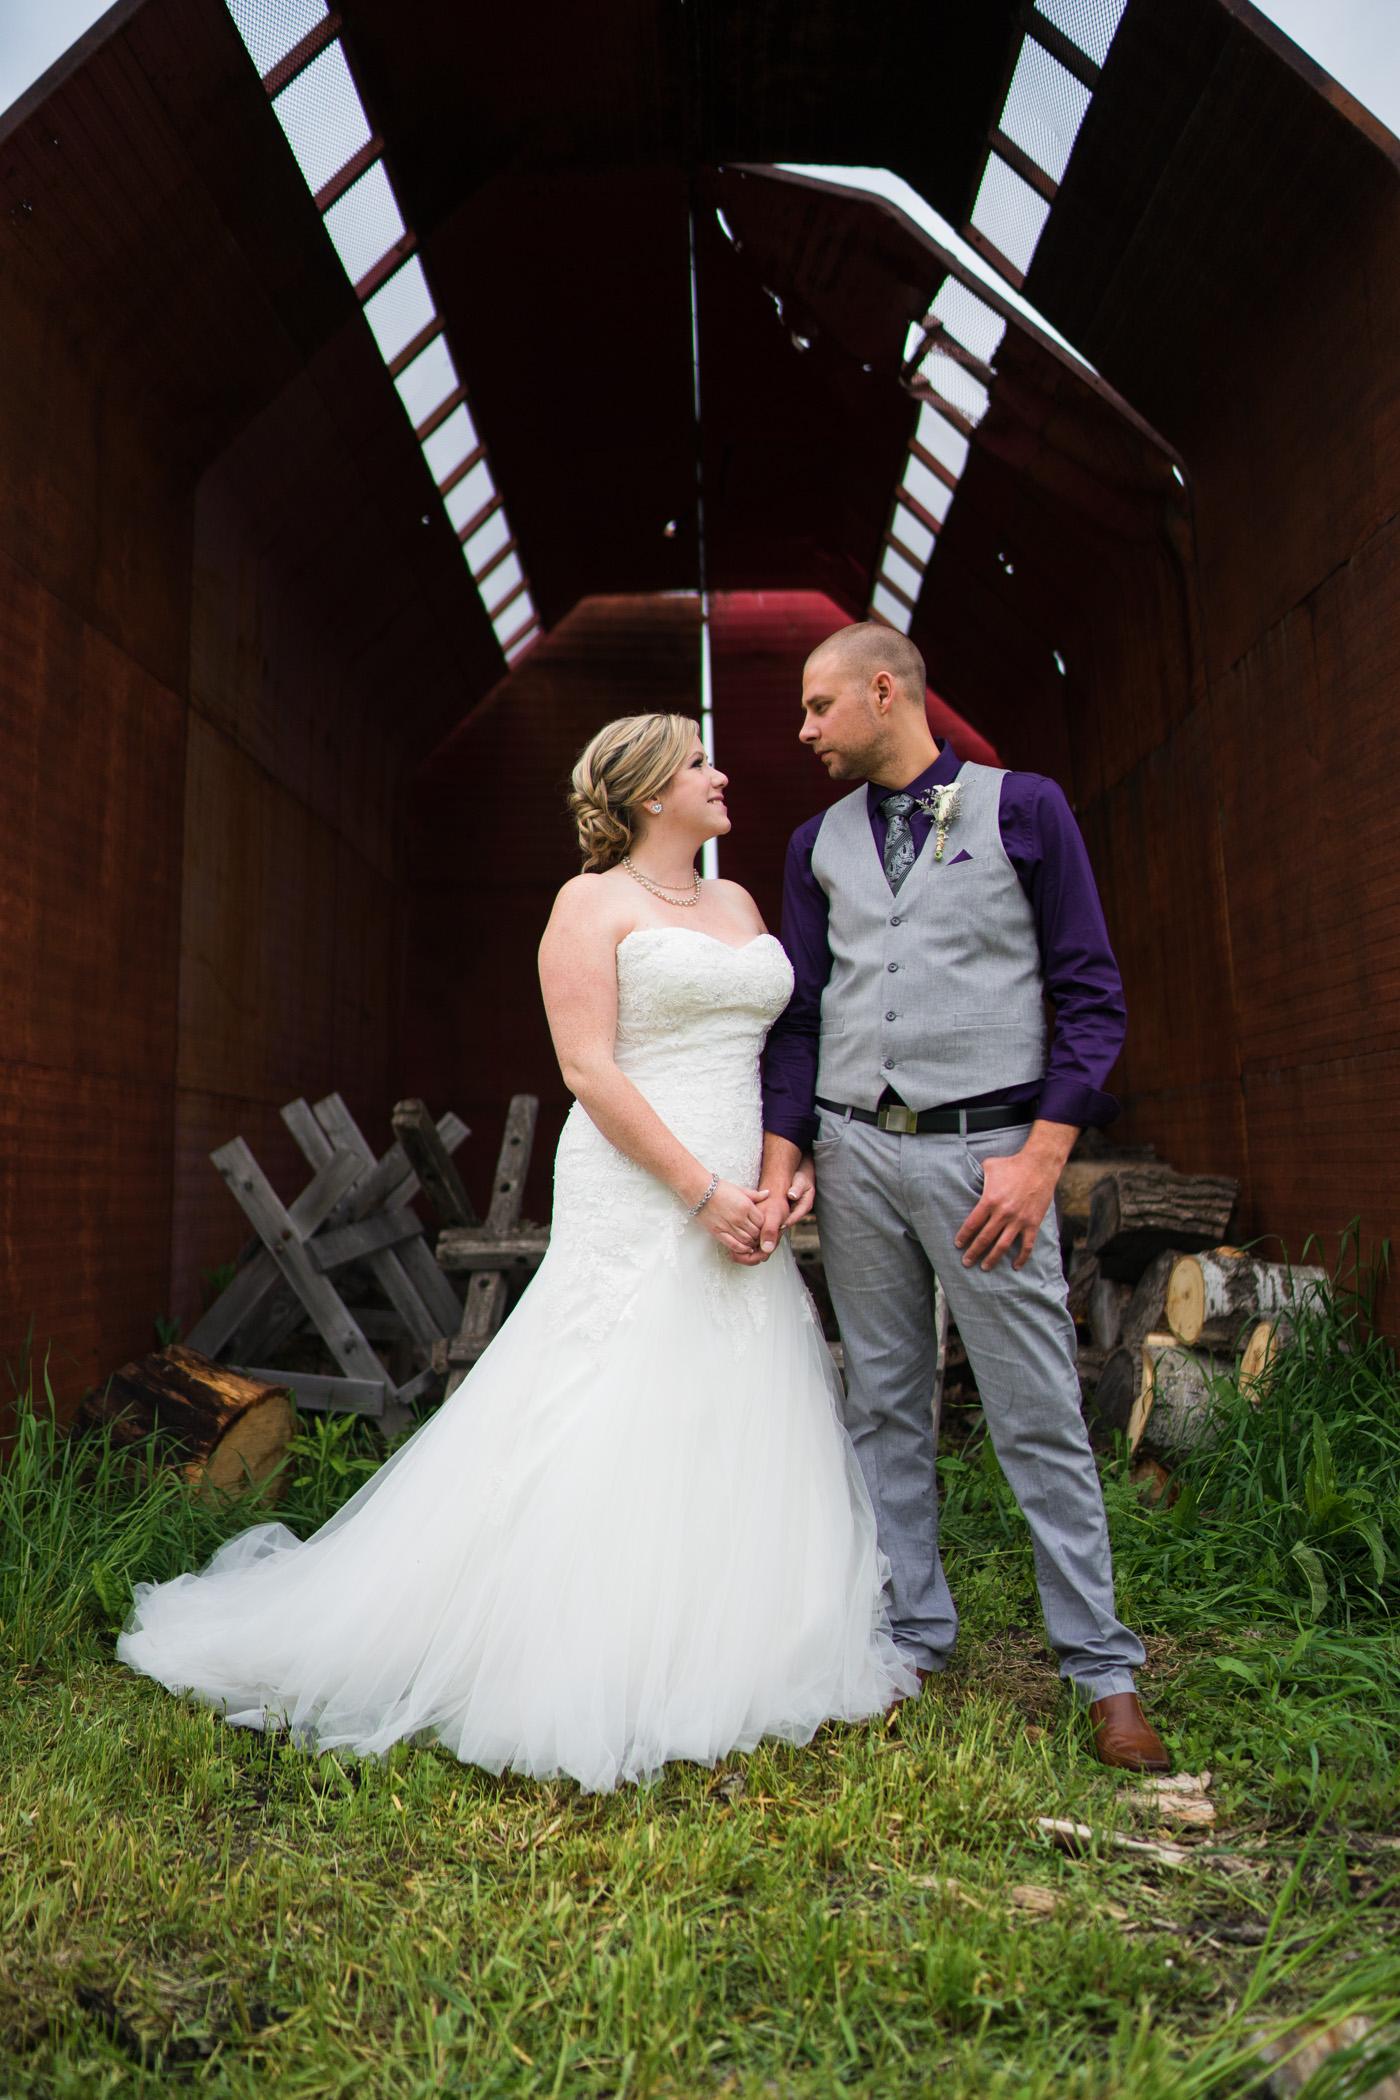 COJO Photo - Whitney and Steve - Wedding-395.jpg